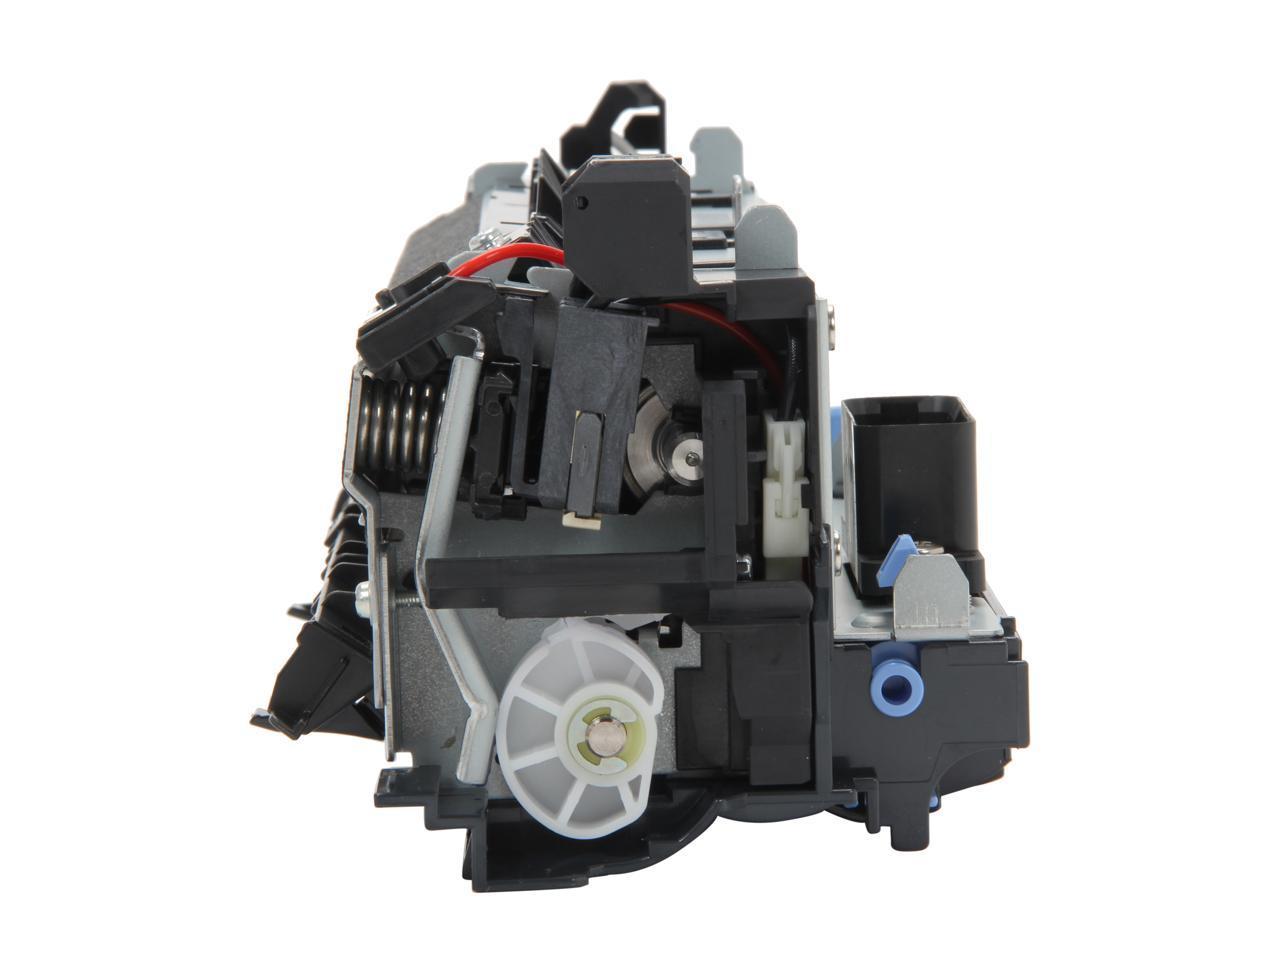 QSD Compatible HP CB388A Refurbished Maintenance Kit